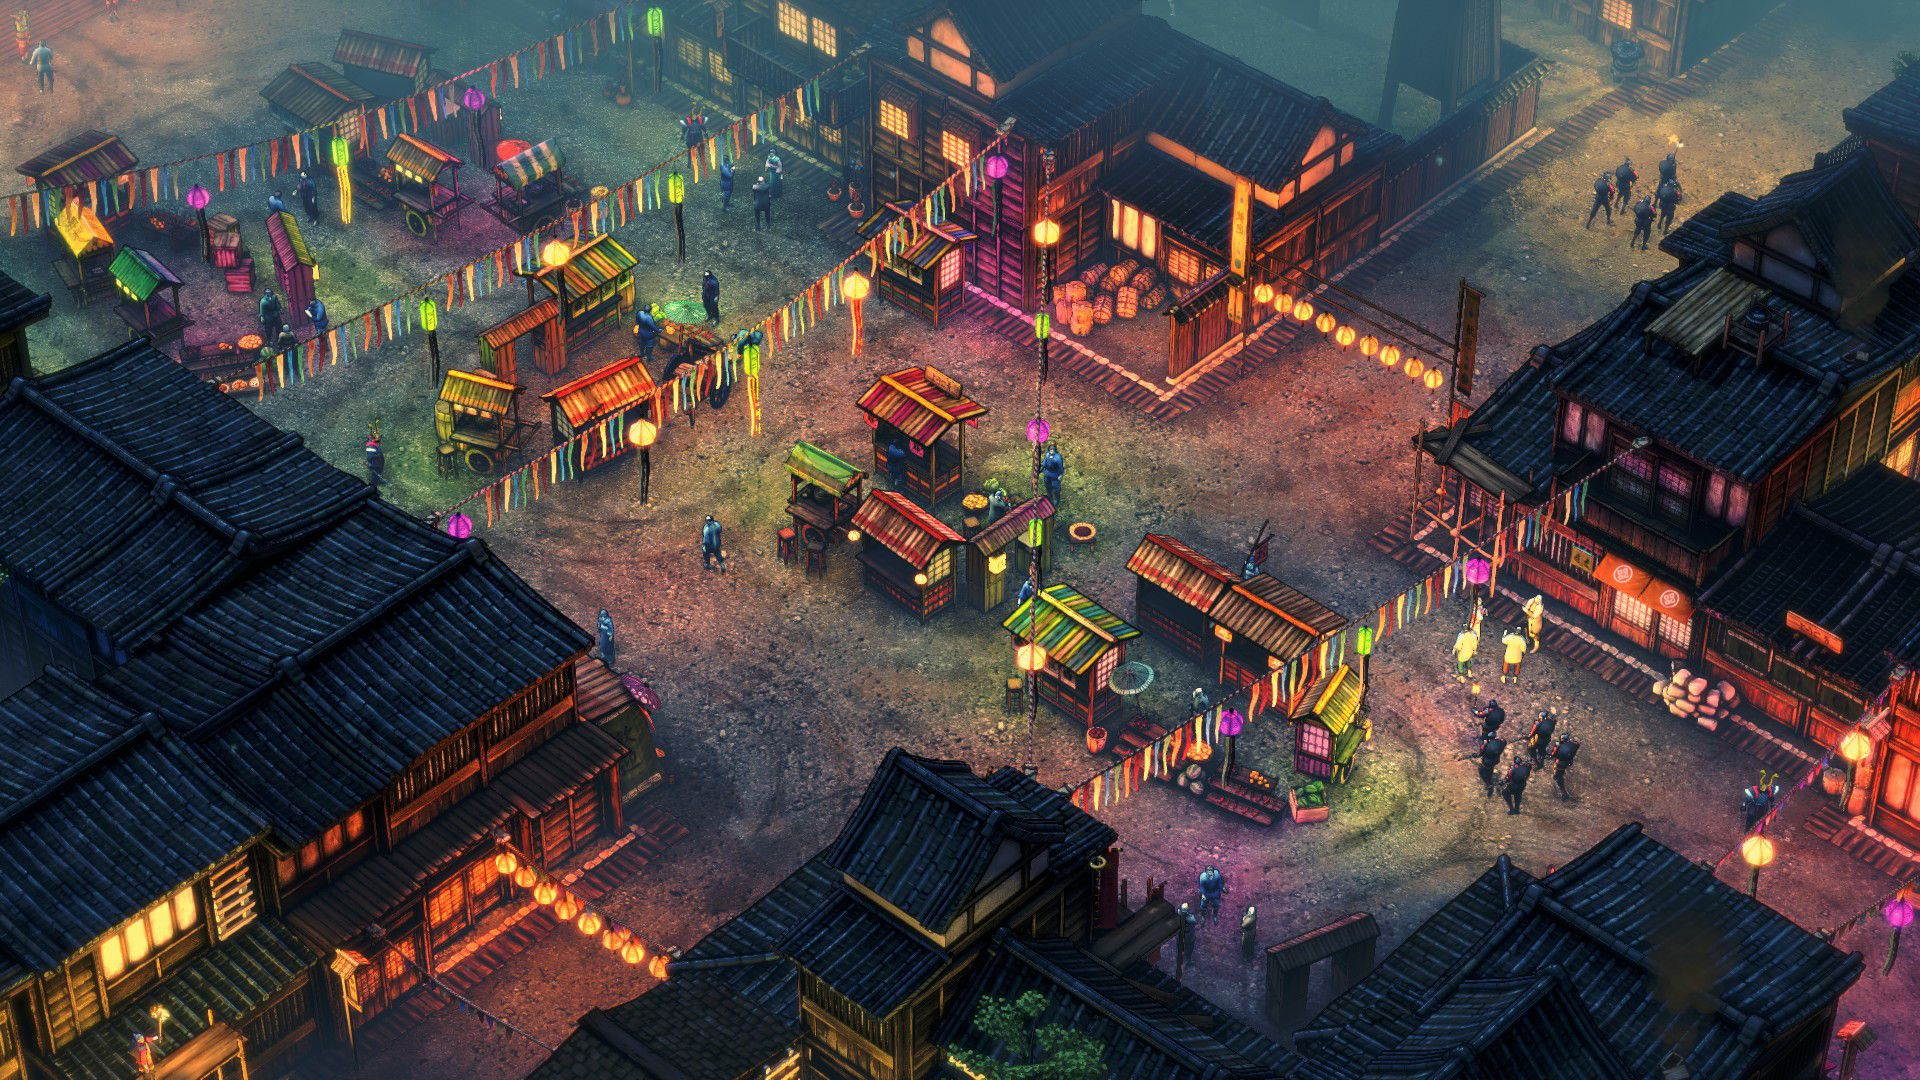 New Games Dead Rising 4 Let It Die The Last Guardian Shadow Nioh Poster Ps4 Region 3 English Tactics Blades Of Shogun Game Screenshot